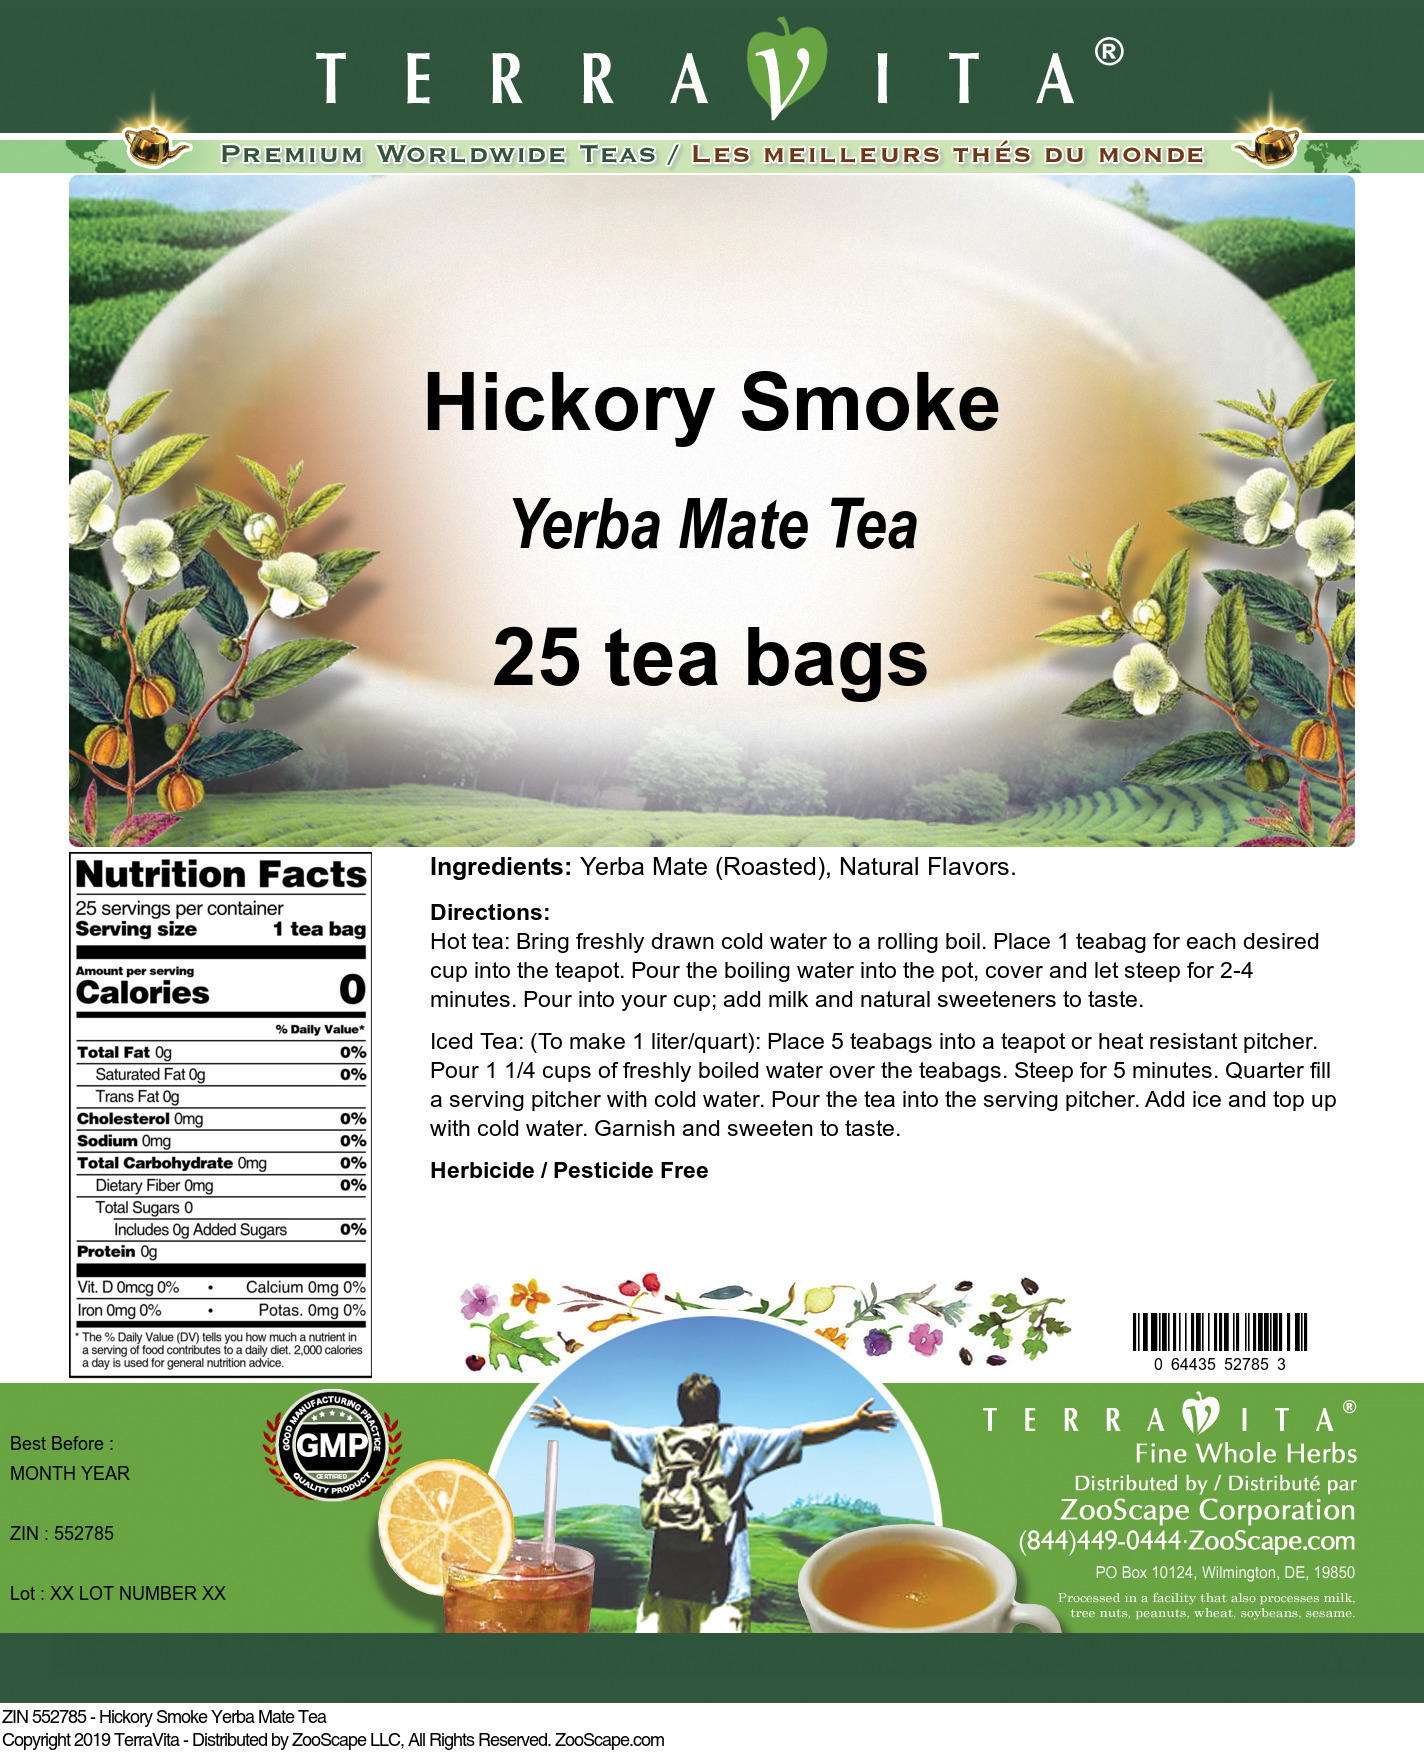 Hickory Smoke Yerba Mate